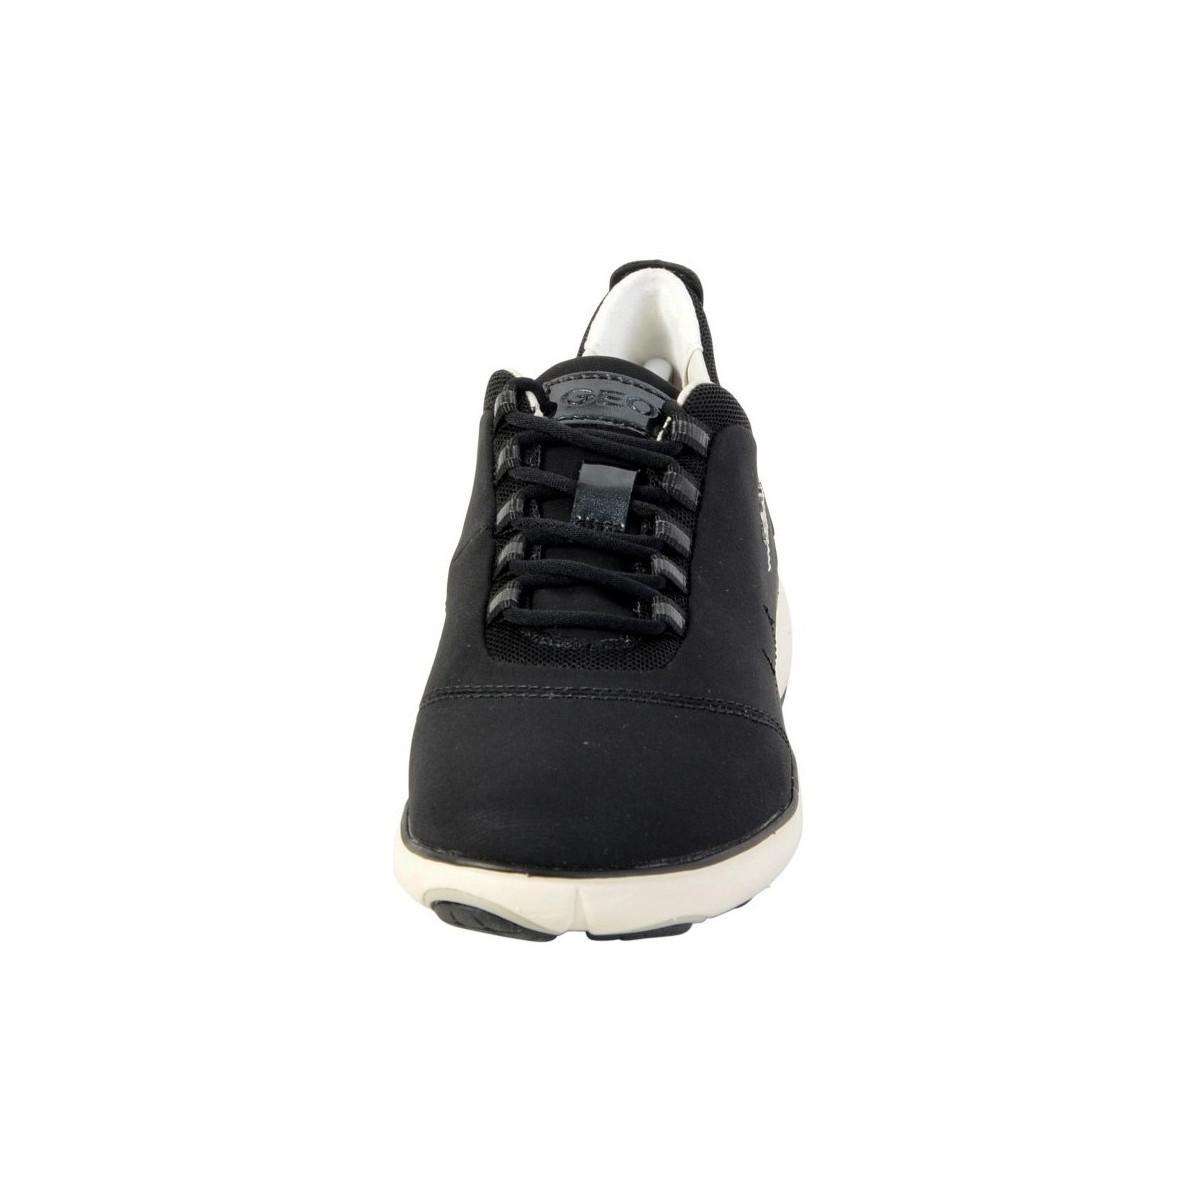 Geox Sneakers Nebula Black D621ea 00011 C9999 Men's Shoes (trainers) In Black for Men